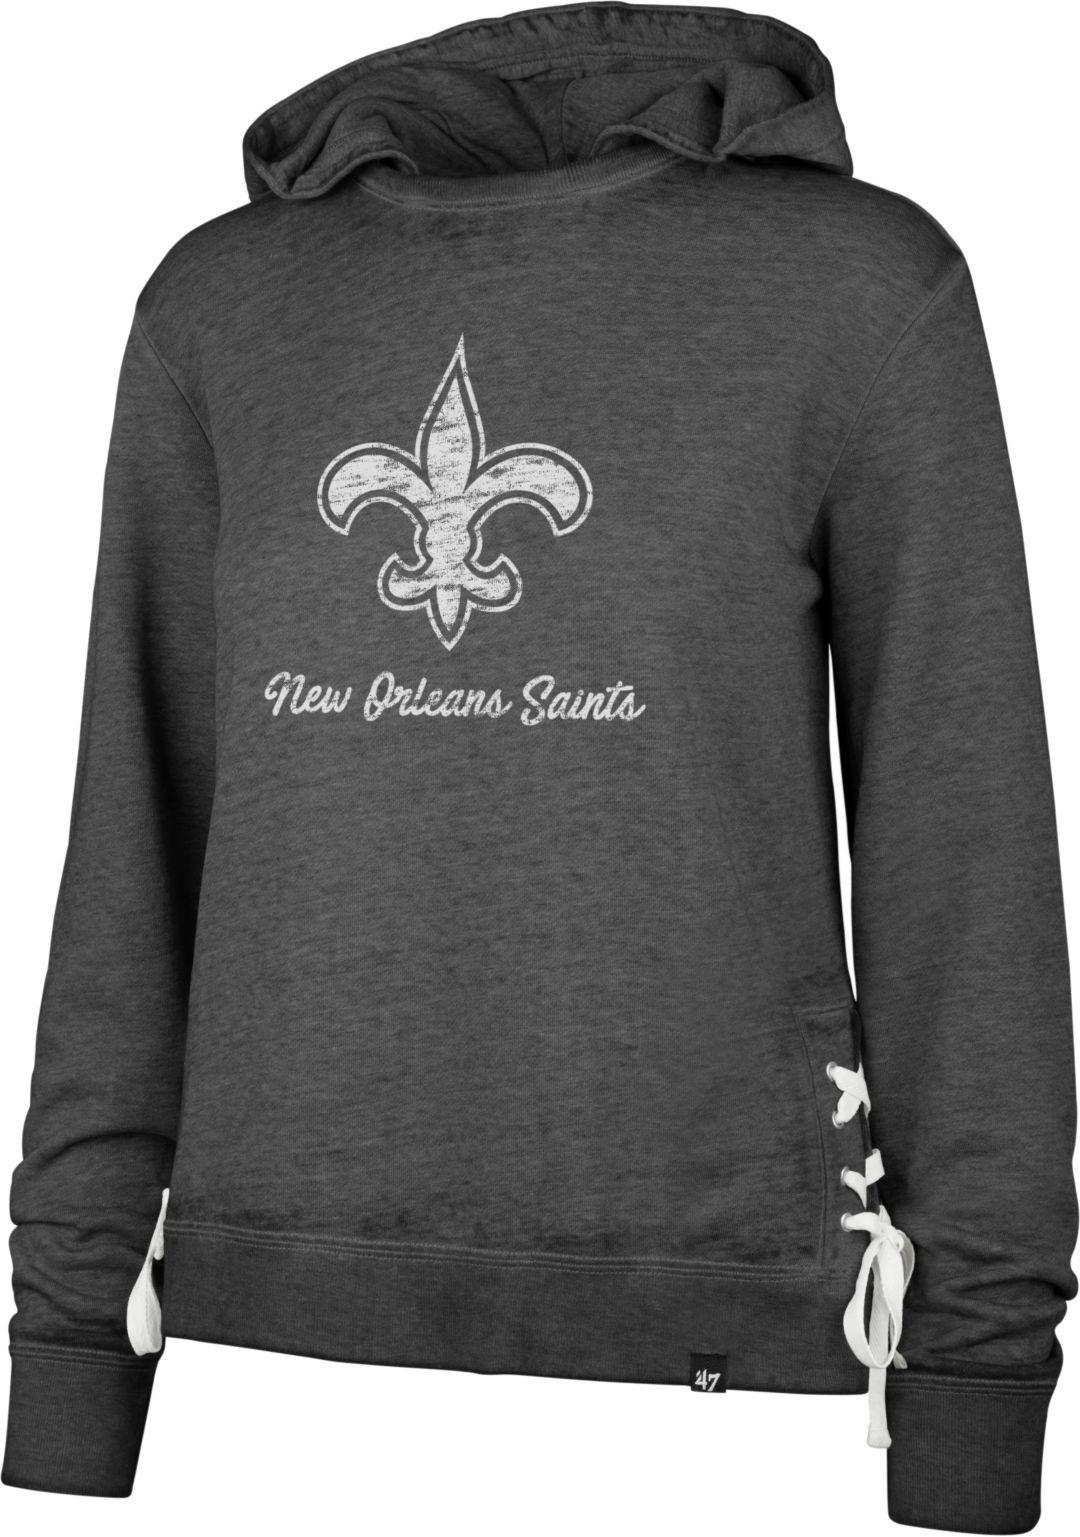 47 Women S New Orleans Saints Side Lace Black Hoodie